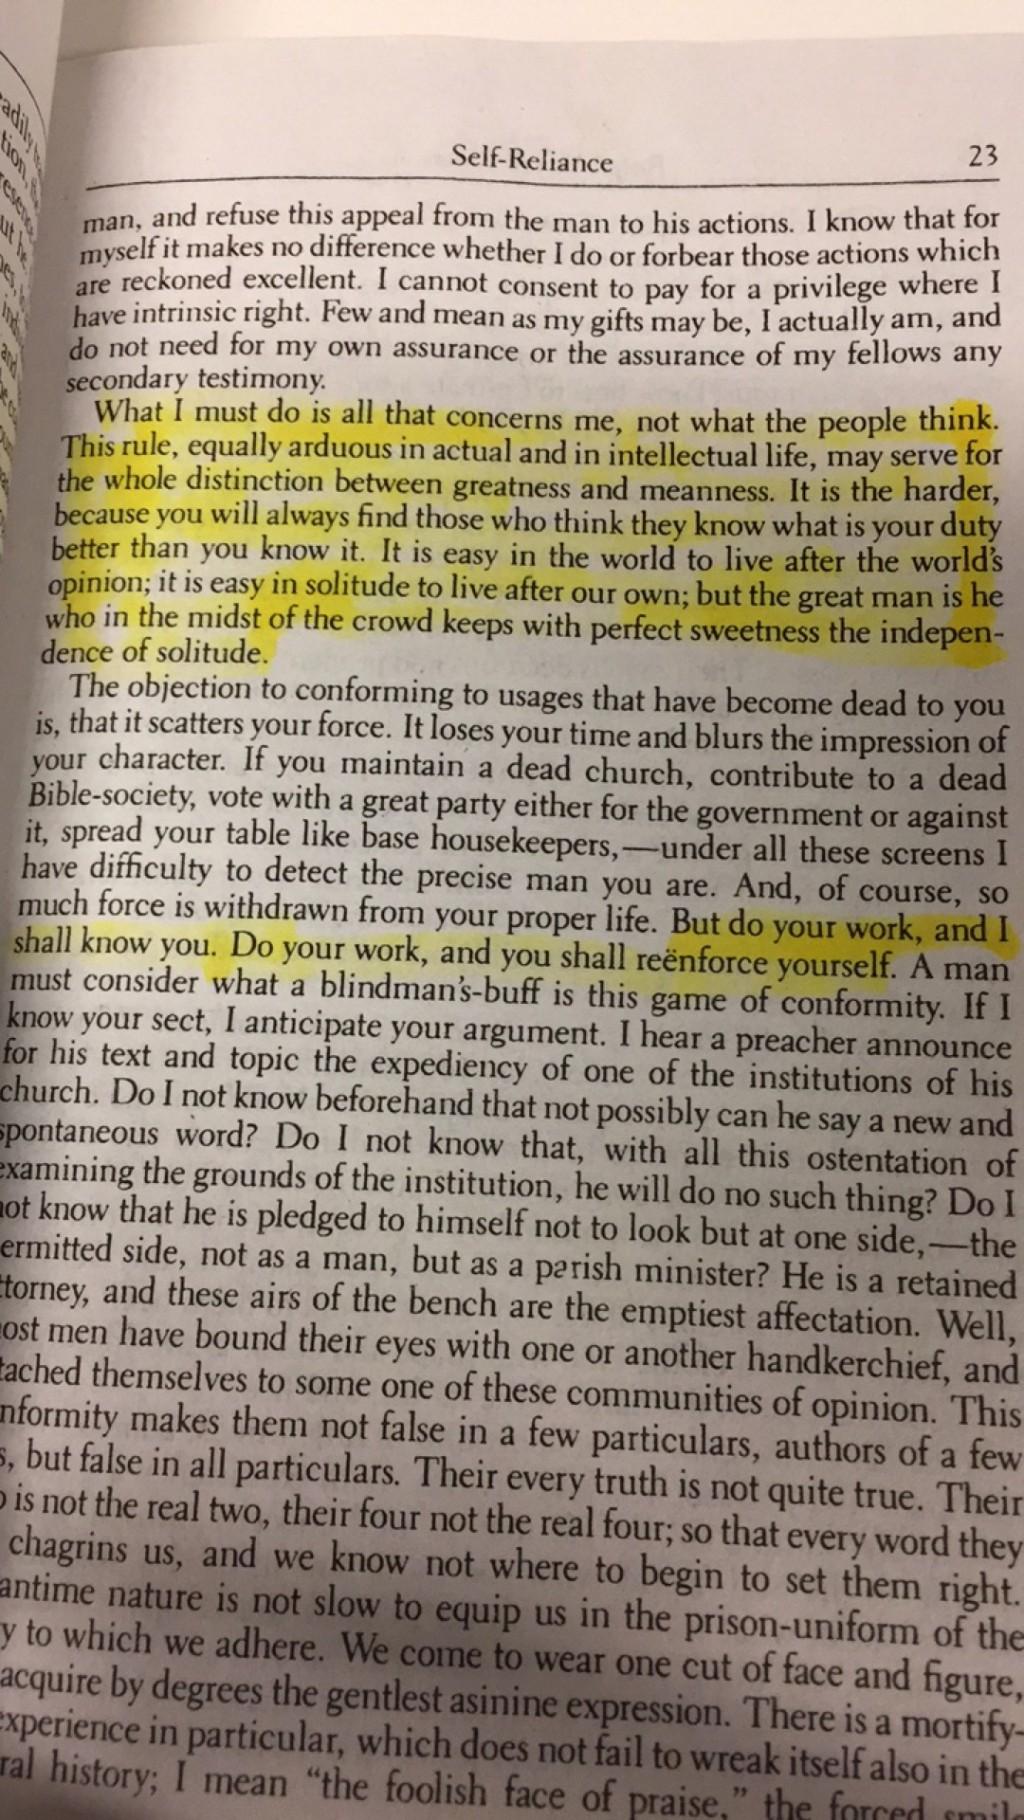 010 Self Reliance And Other Essays By Ralph Waldo Emerson Summary Essay Formidable Pdf Ekşi Large